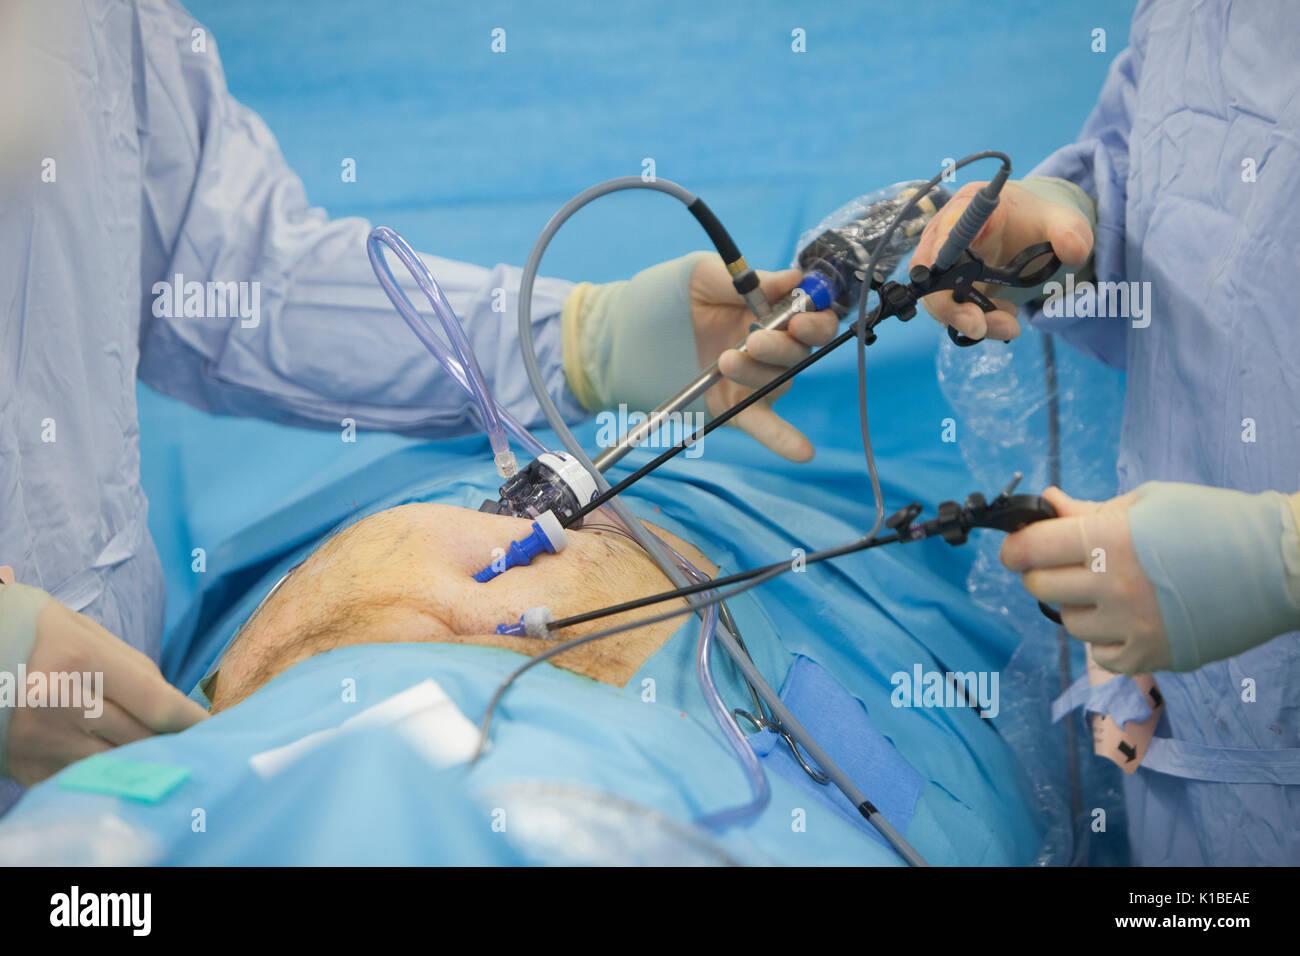 Larascopic operation to repair a bilateral hernia - Stock Image